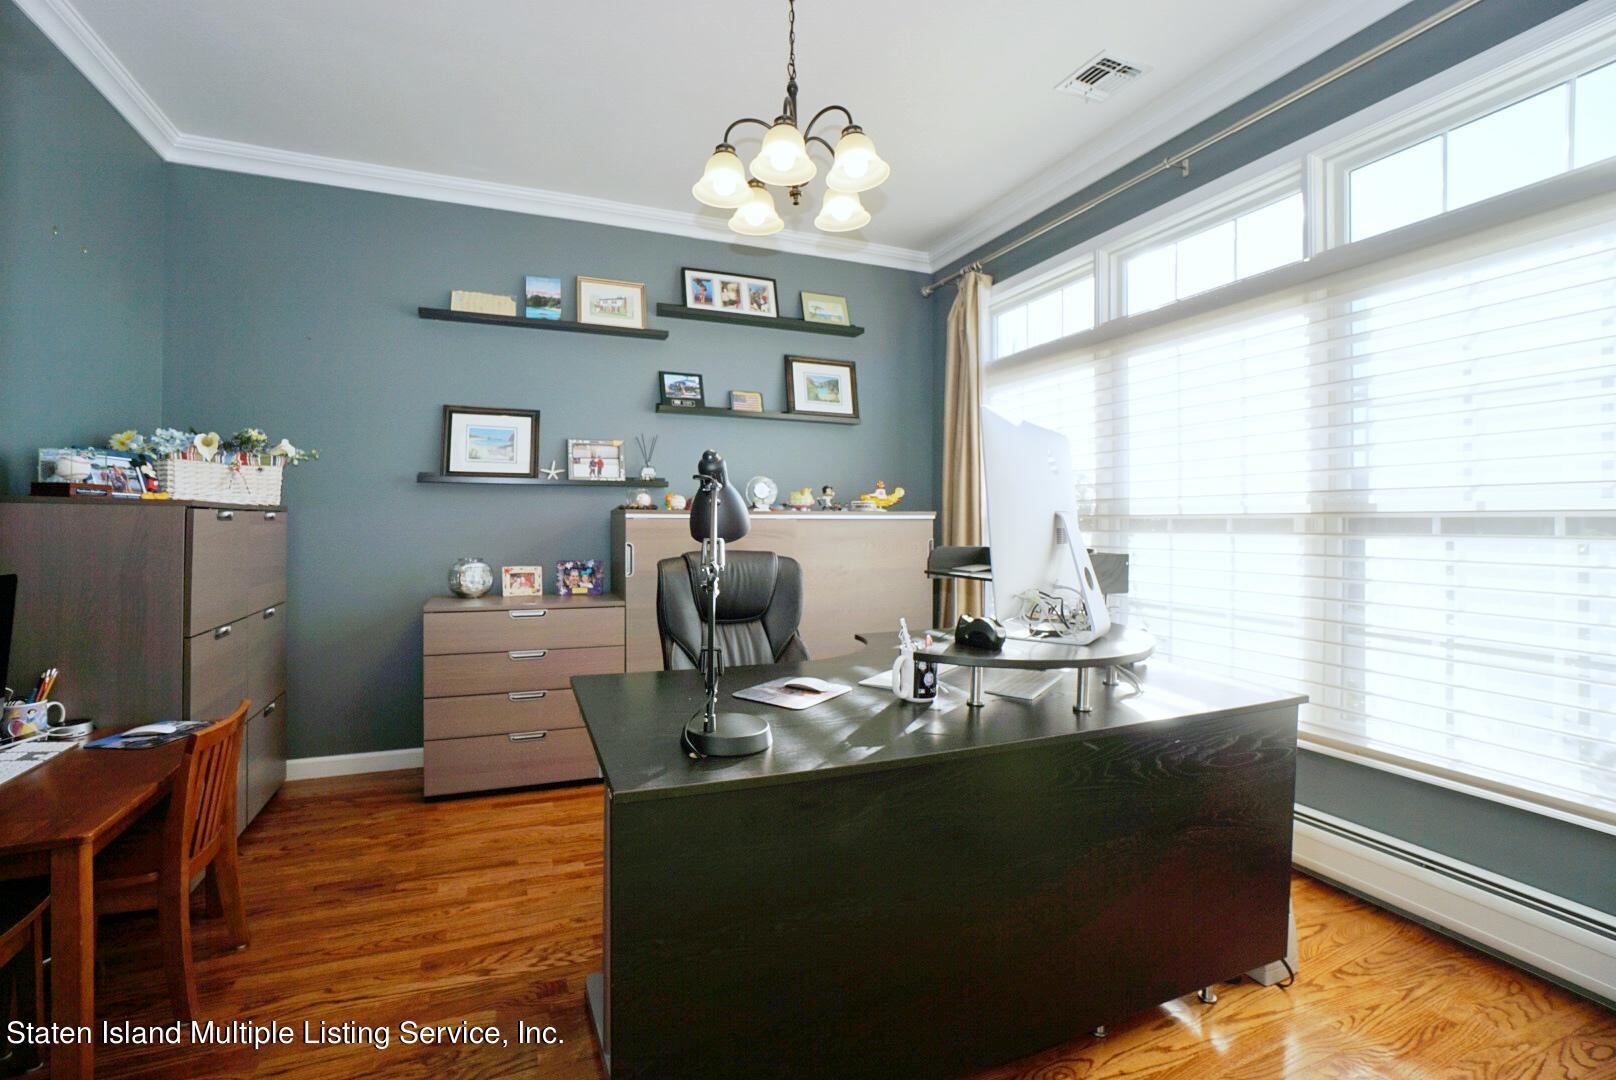 Single Family - Detached 31 Belwood Loop  Staten Island, NY 10307, MLS-1143133-9